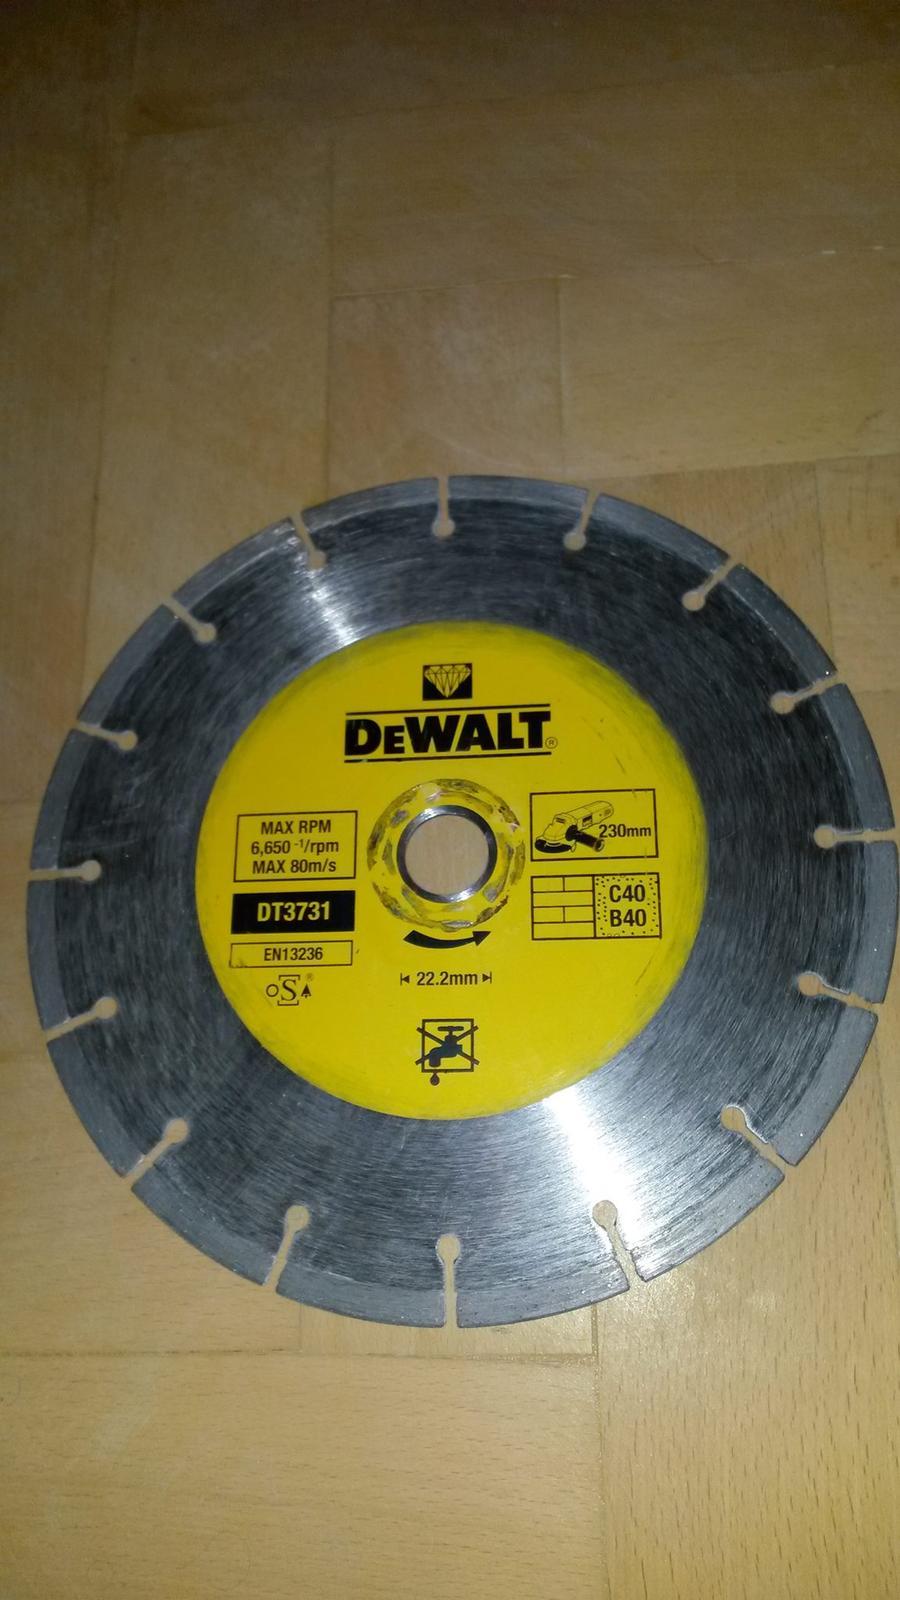 Diamantovy kotuc rezny - DeWalt 230 mm - Obrázok č. 1